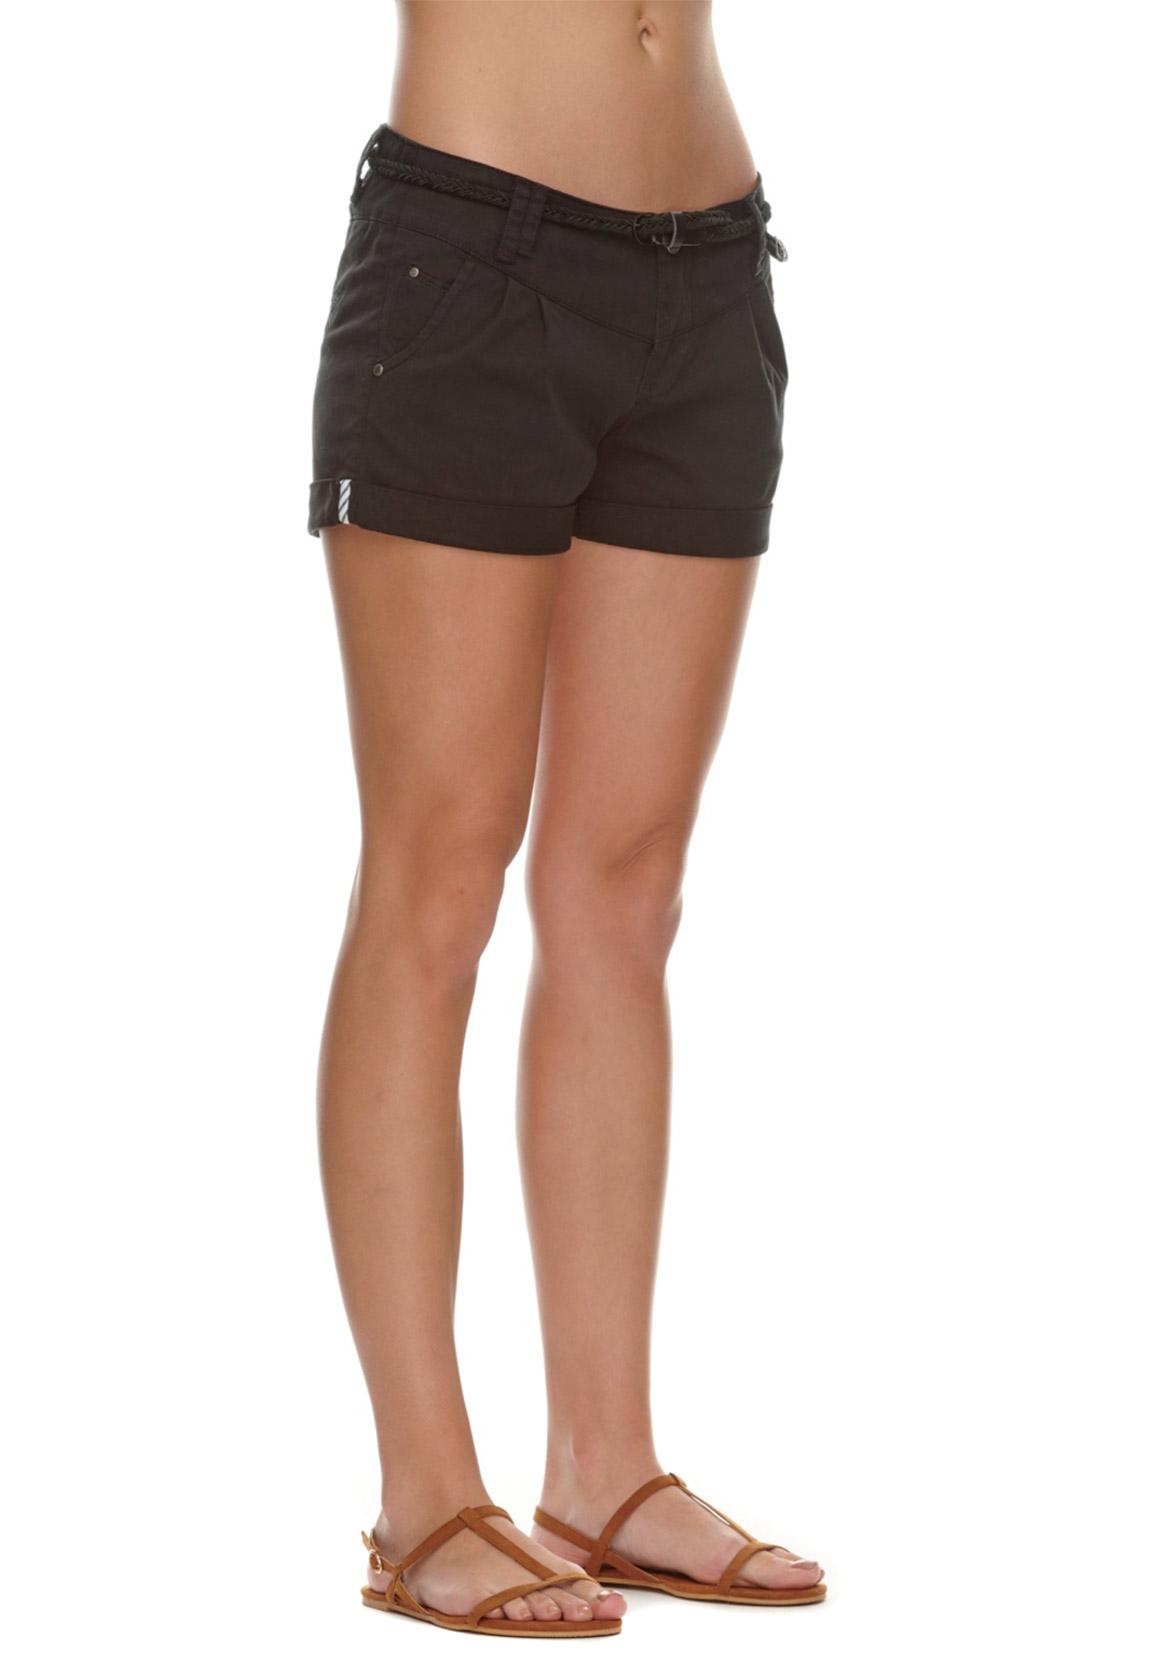 Ragwear Damen Shorts HAVEN B 2111-50007 Black 1010 Schwarz